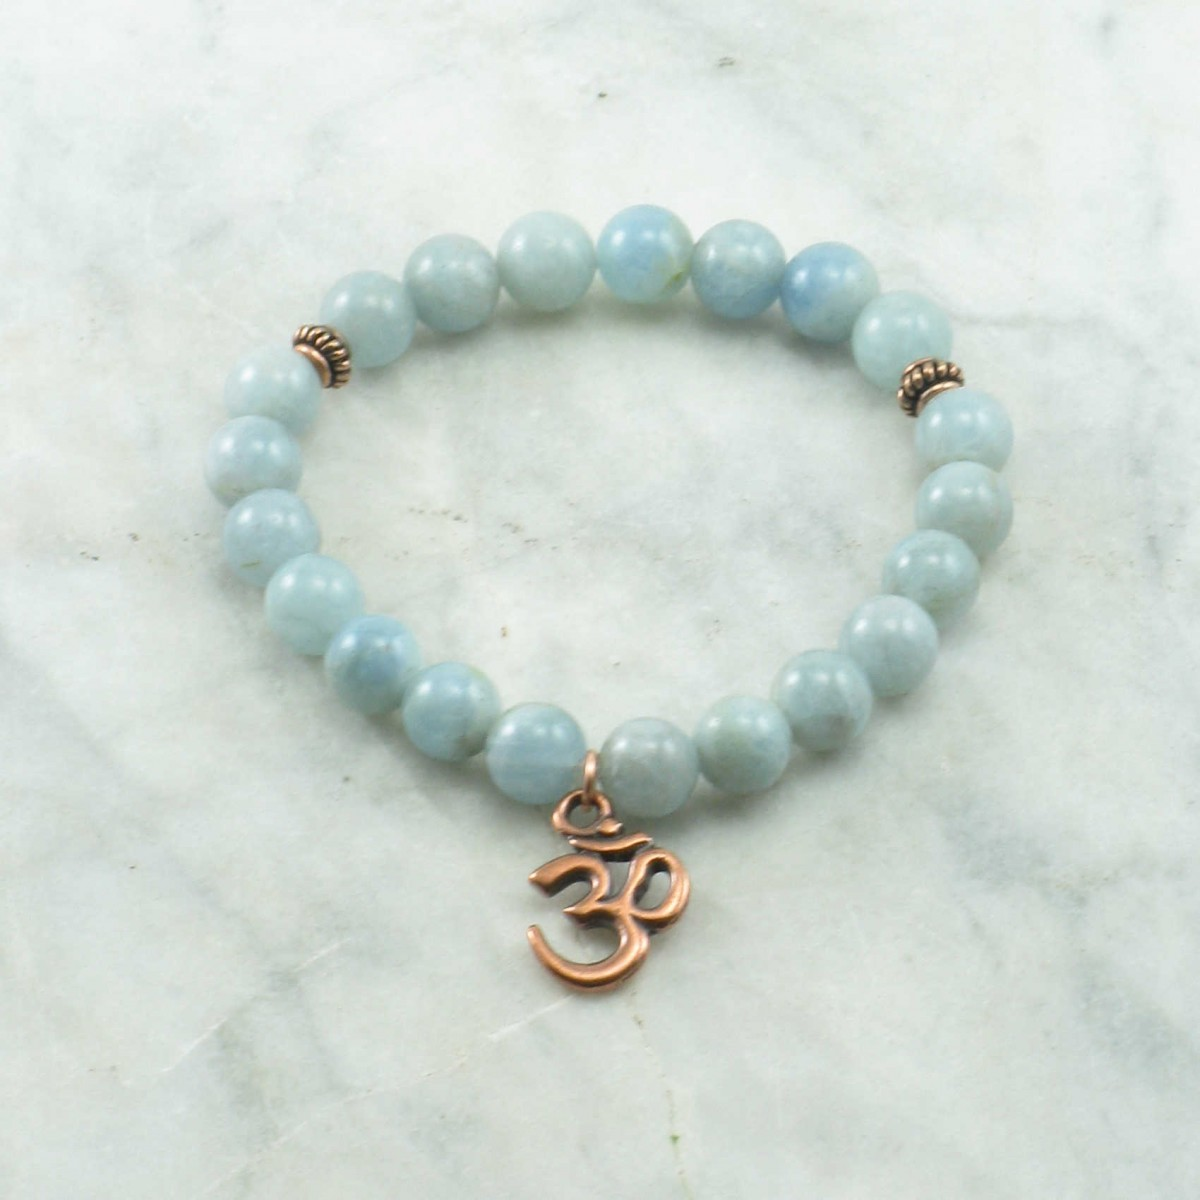 Water_Of_the_Sea_Aquamarine_Mala_Beads_Mala_Bracelet